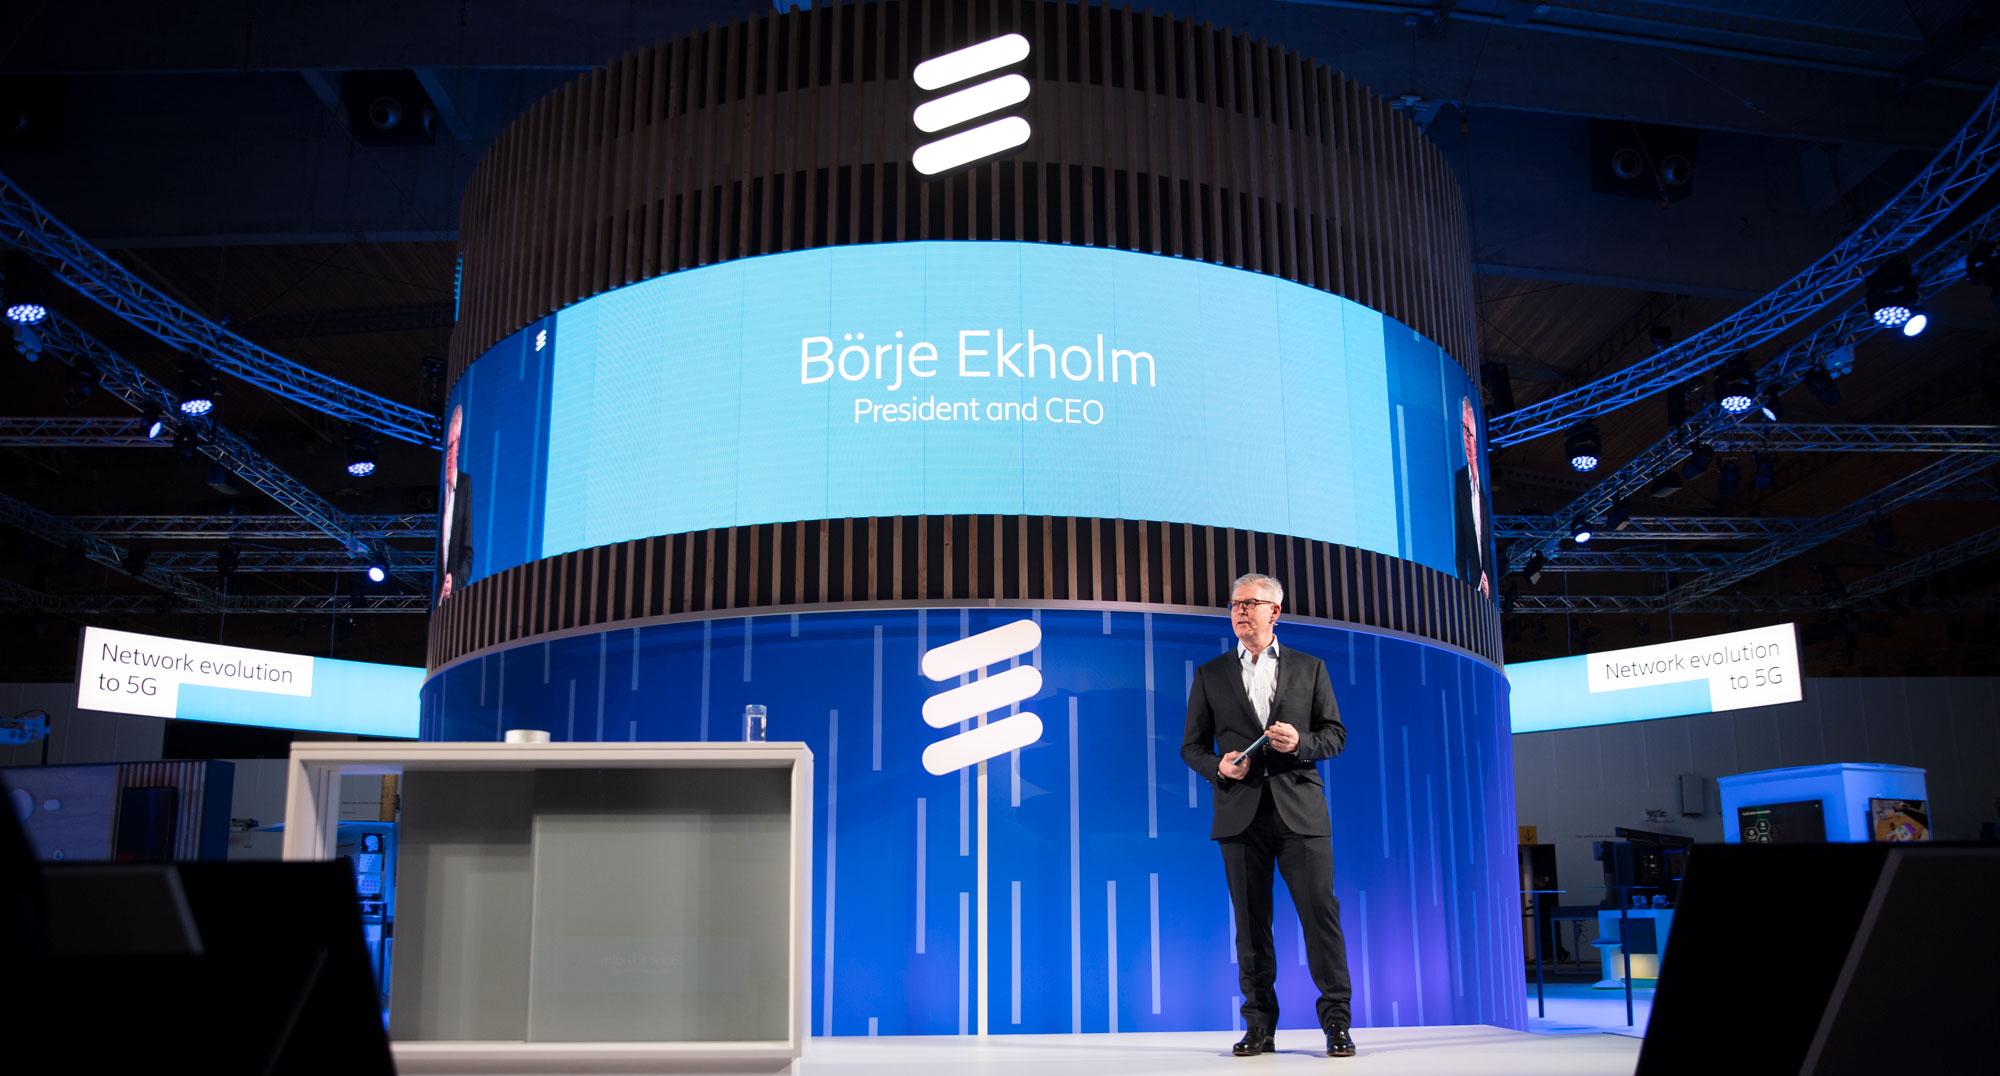 Börje Ekholm: Ericsson to switch on 5G globally in 2019